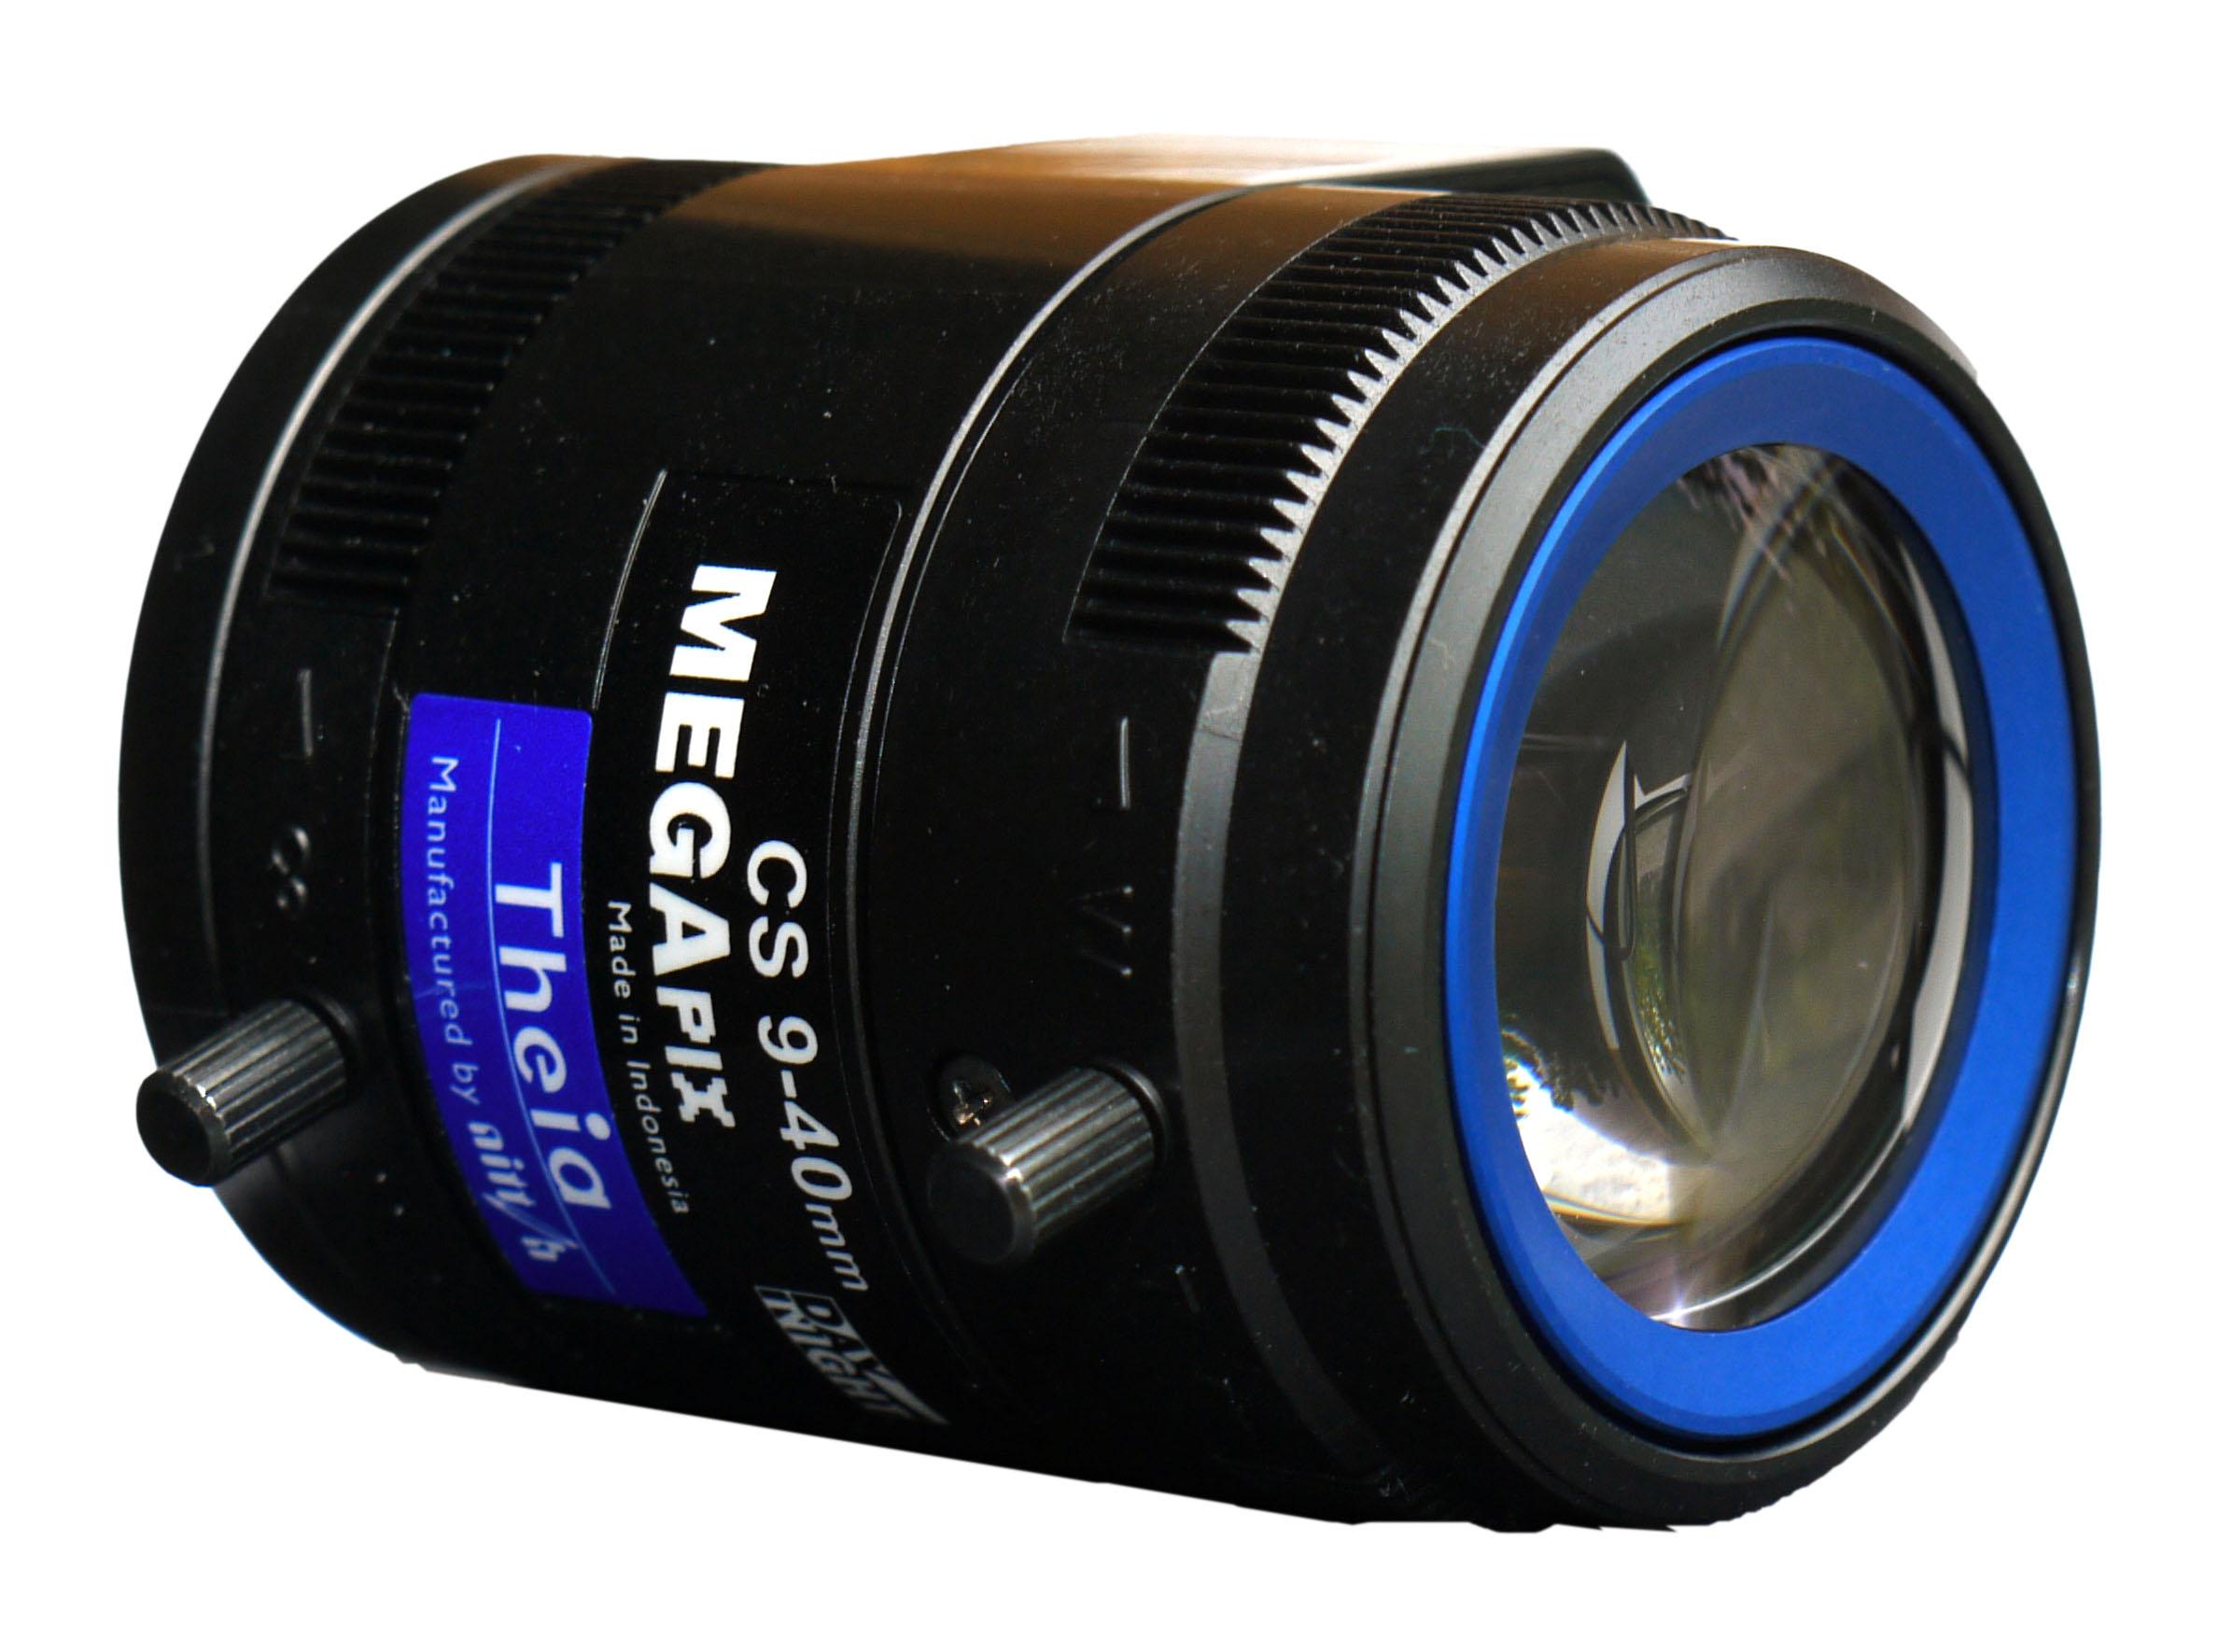 Theia SL940M lens